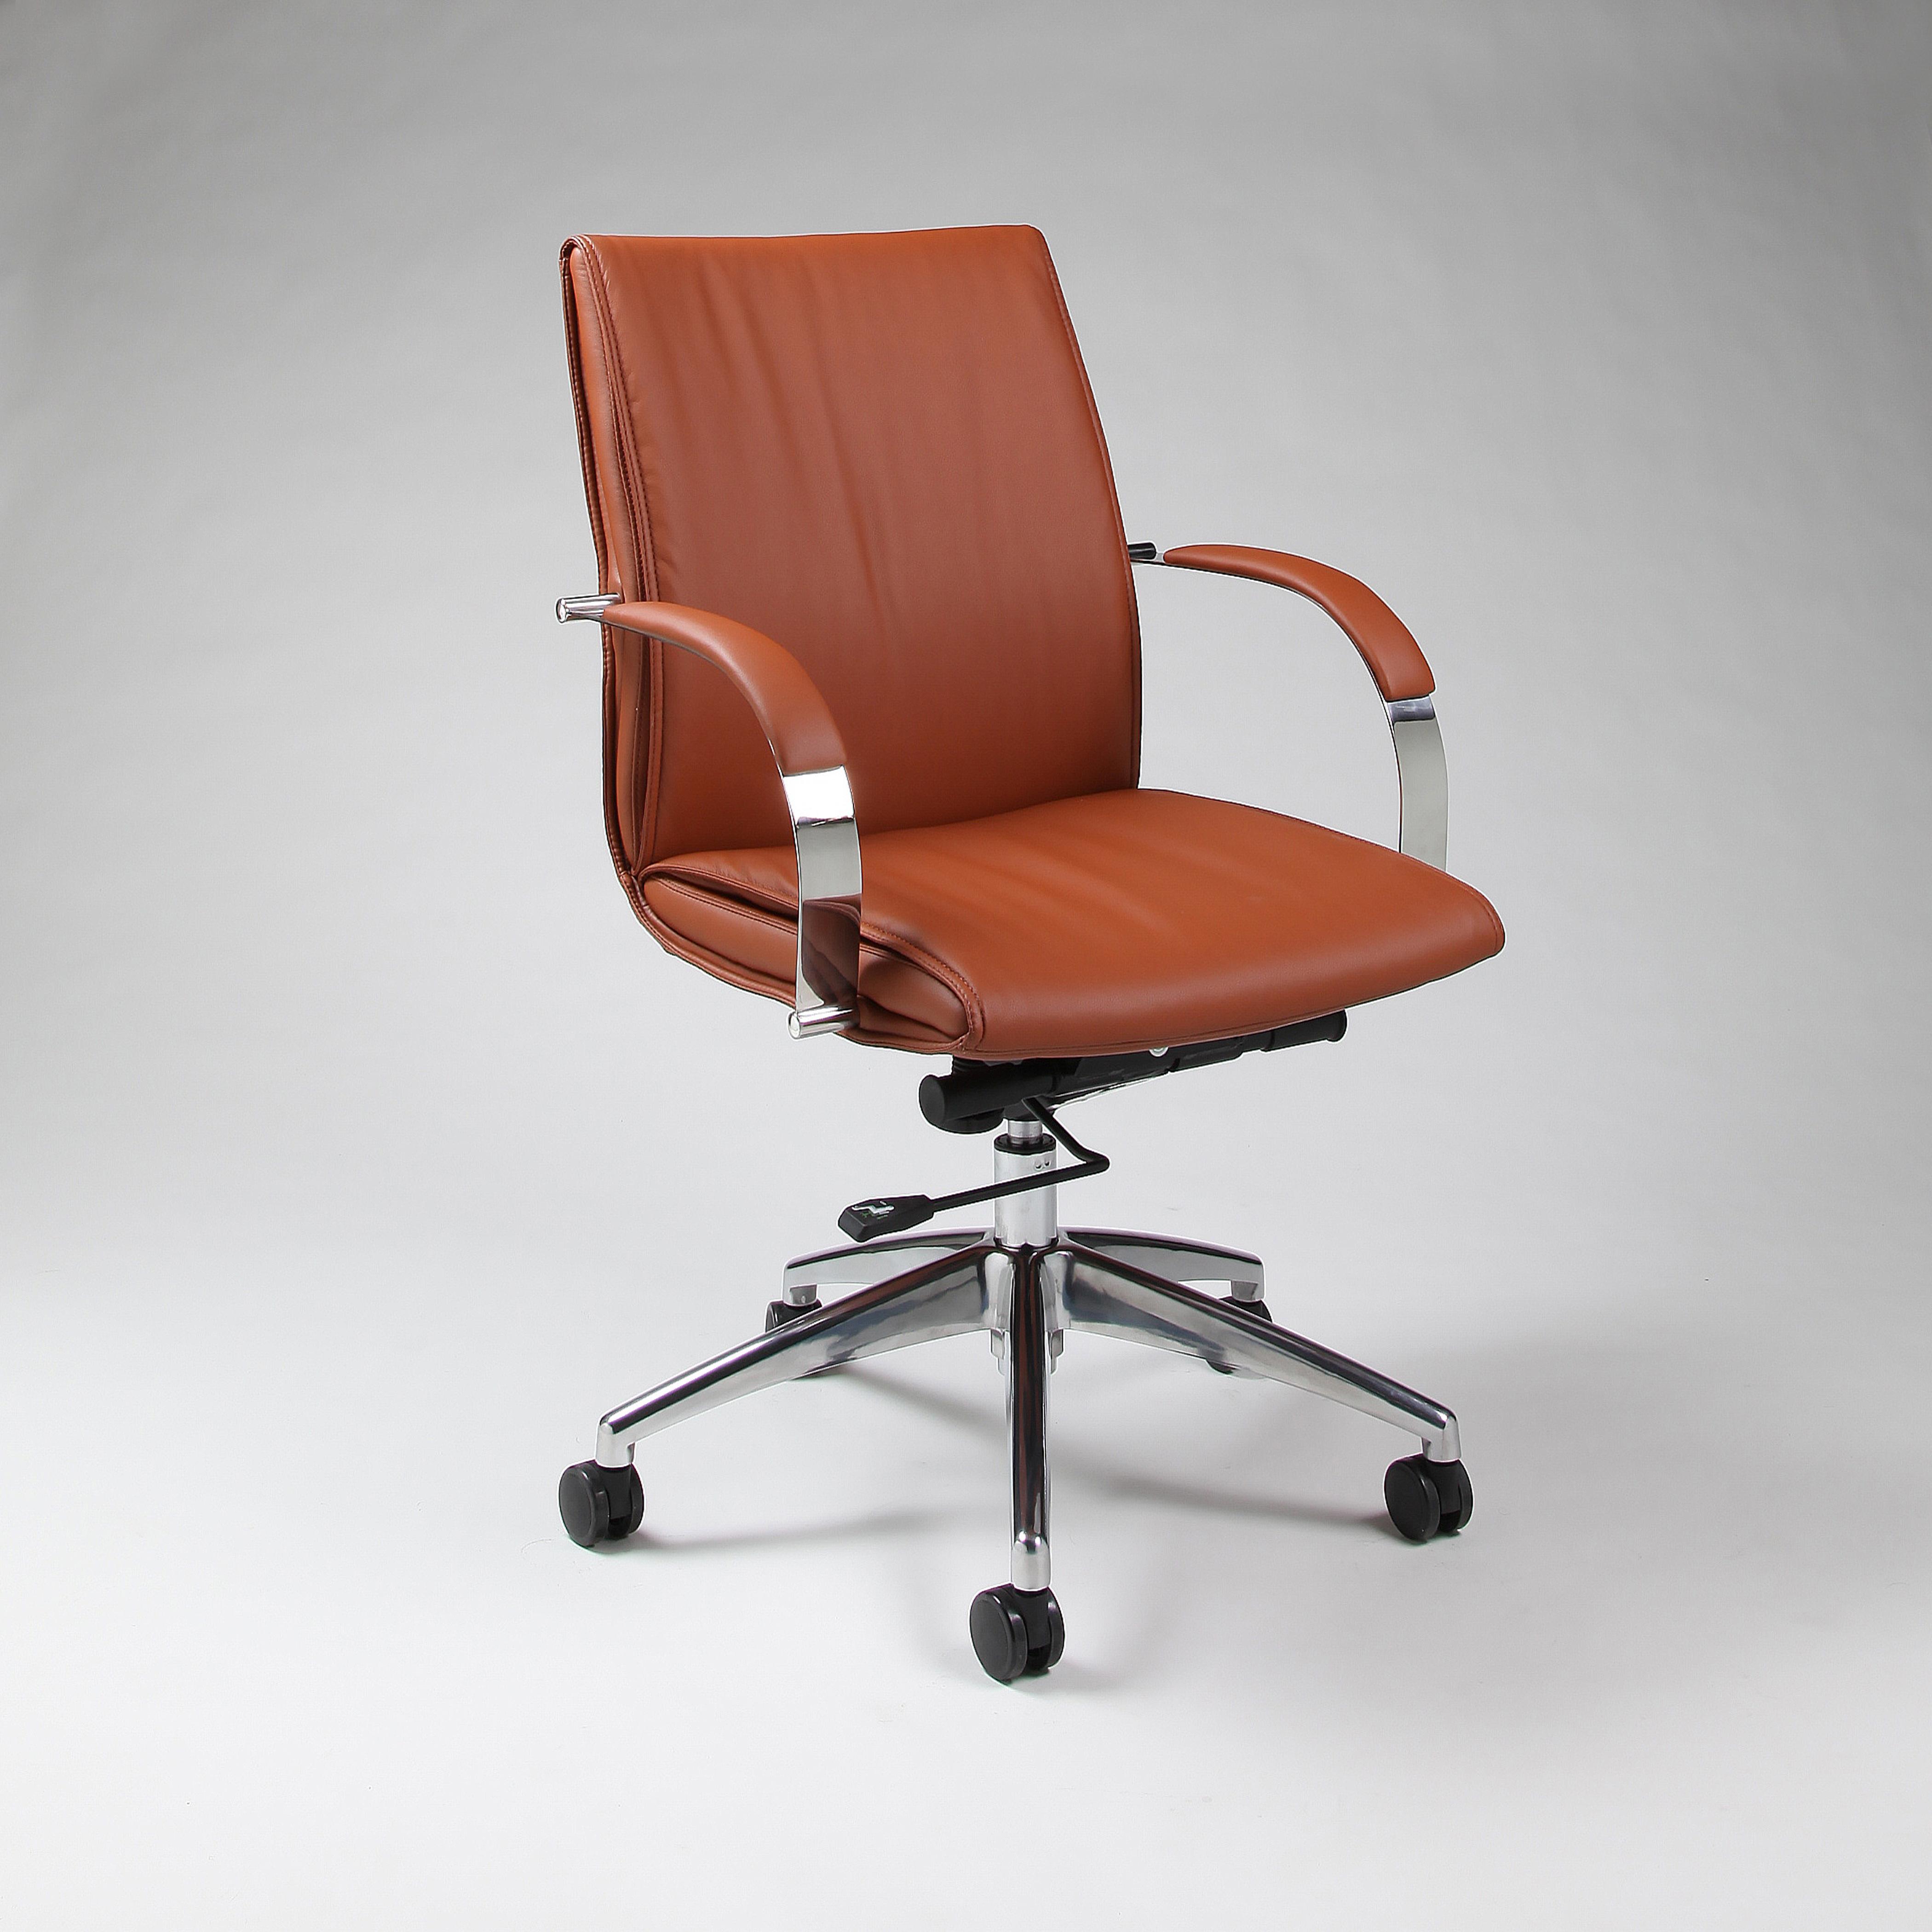 jp_164_ch_al_986_josephina_office_chair